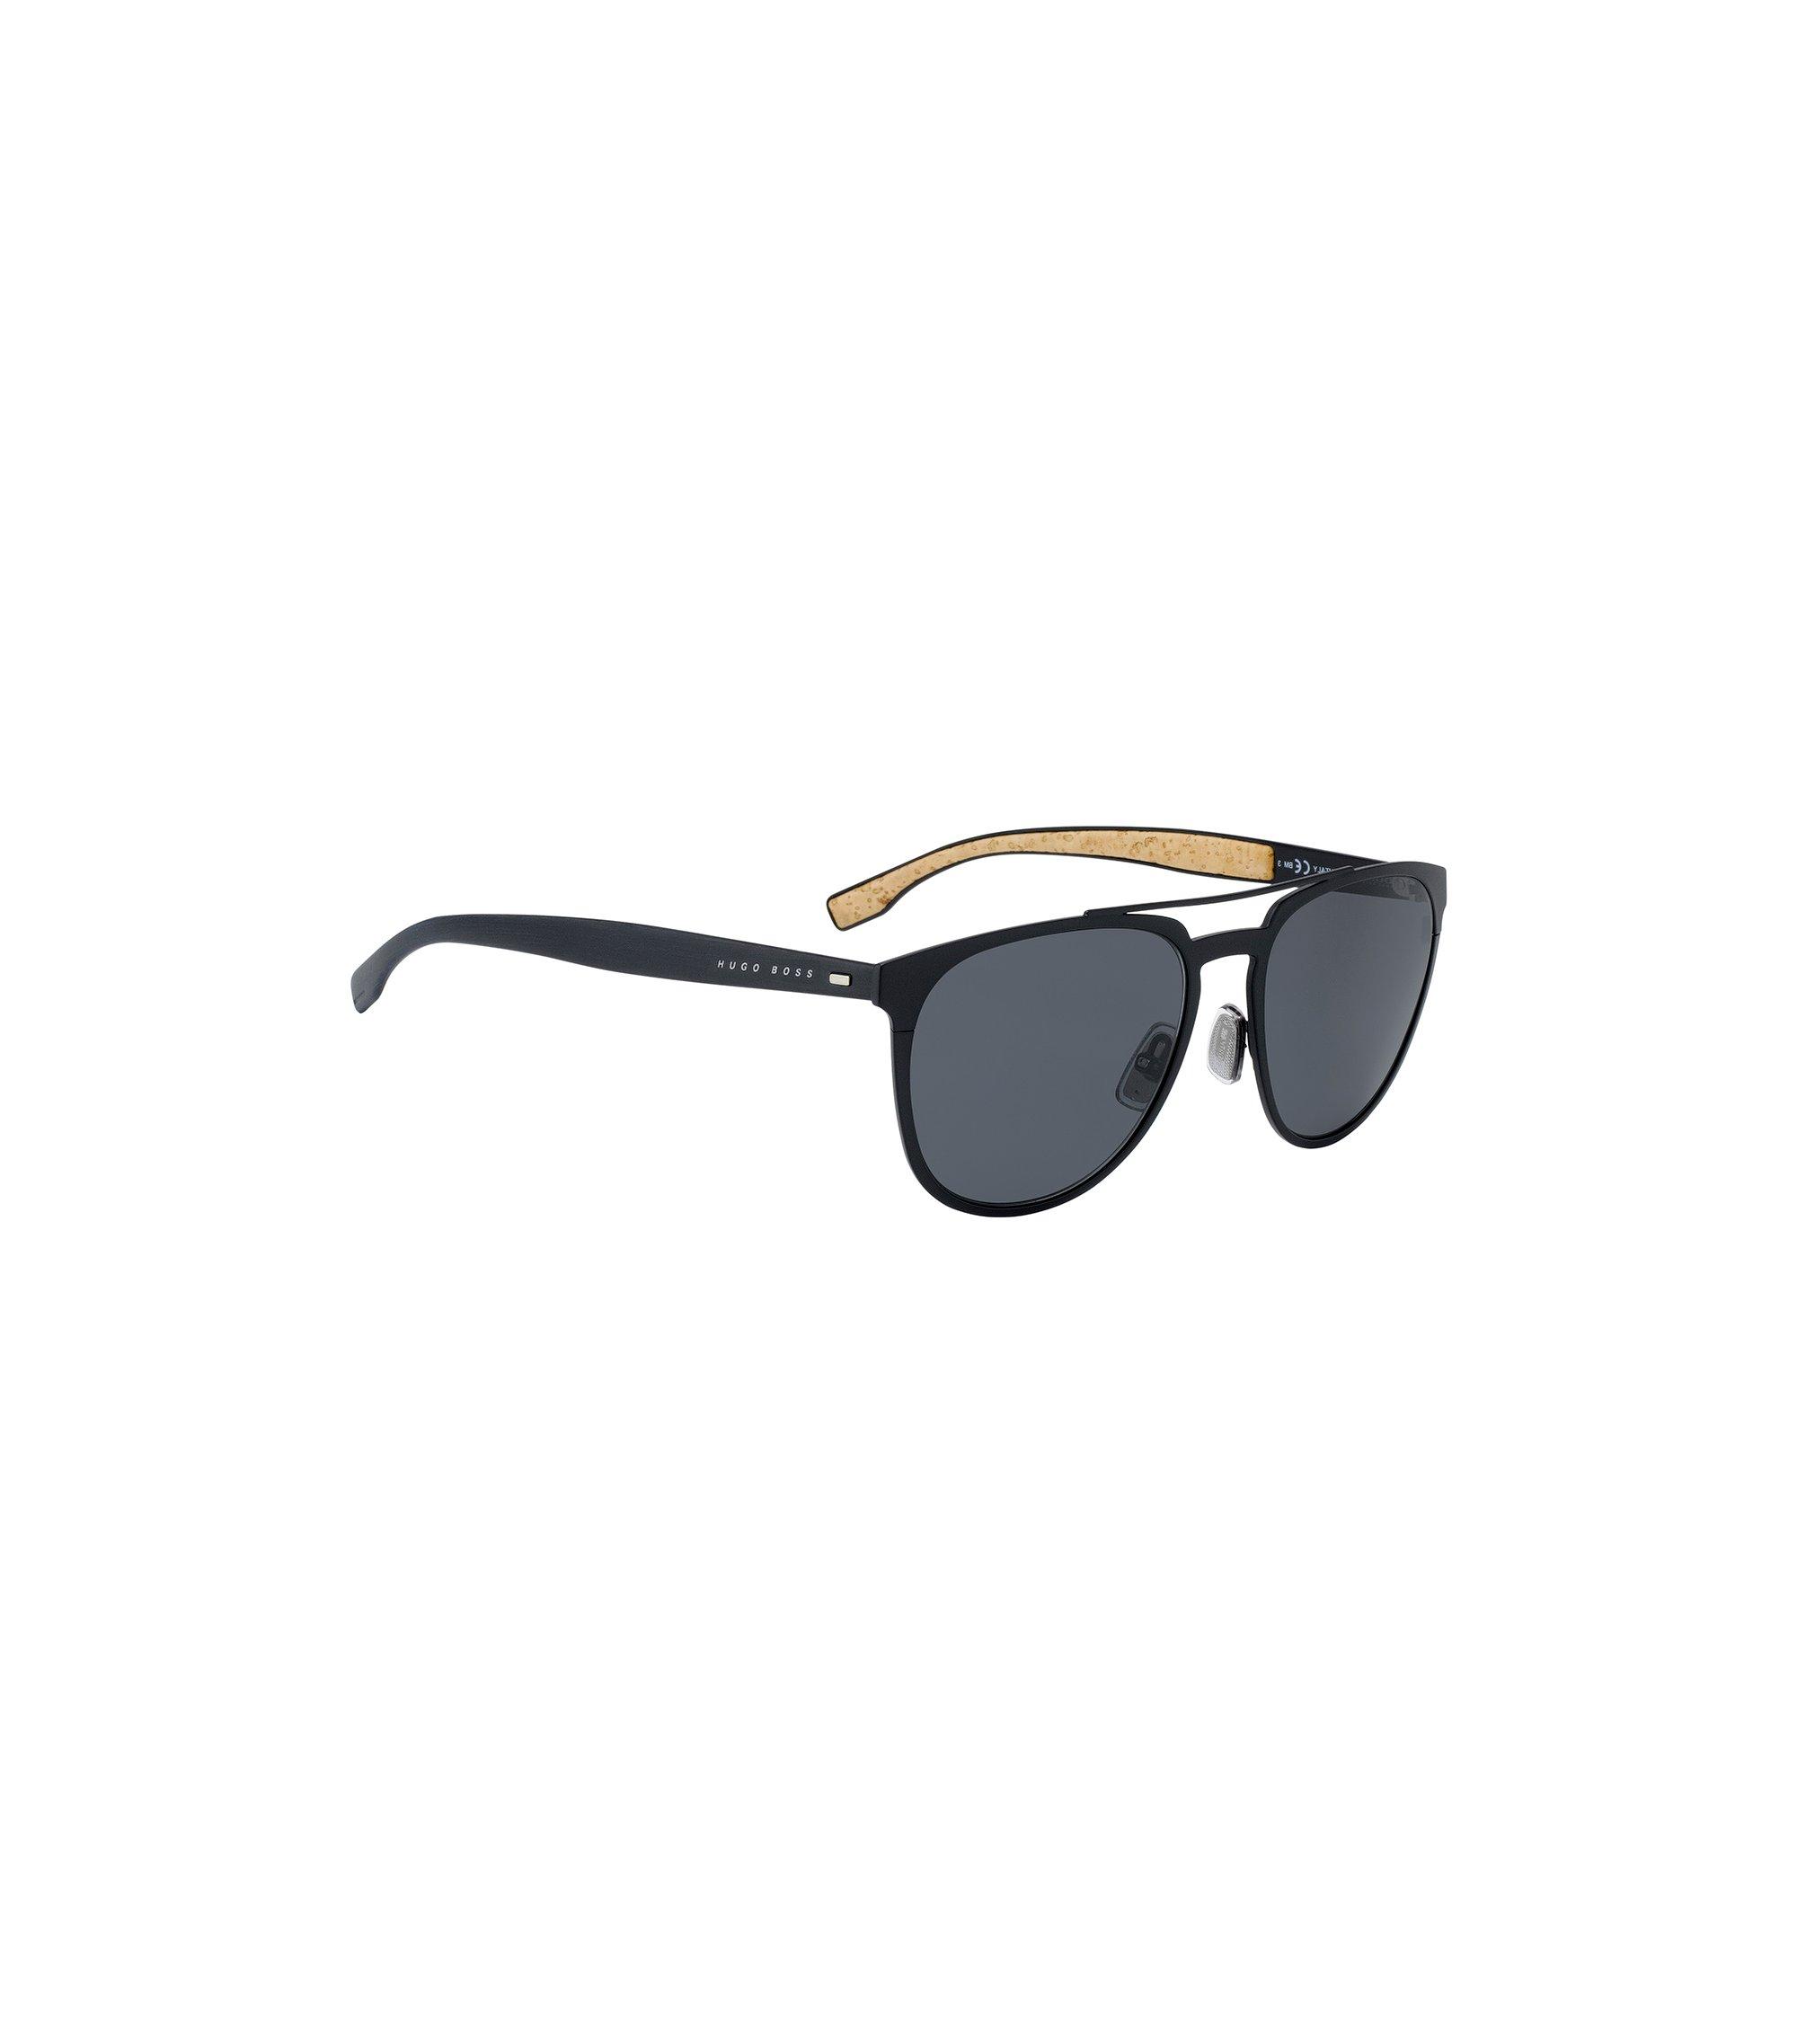 Aviator sunglasses with thin black metallic frames, Black